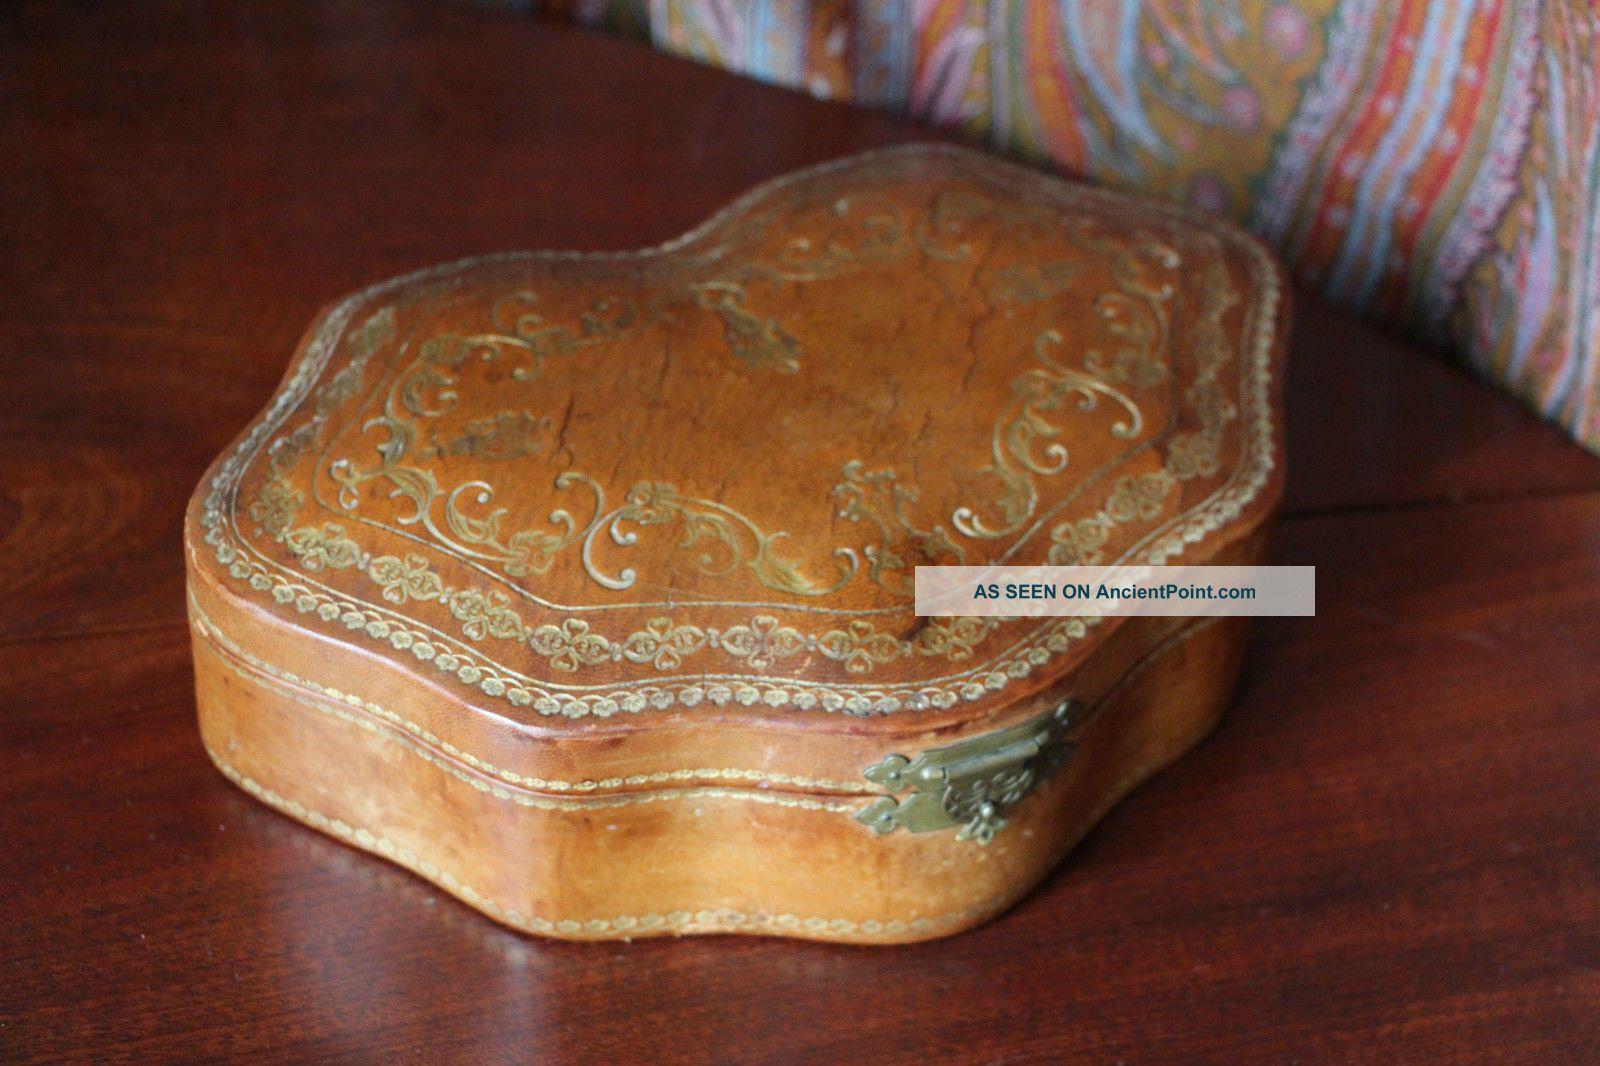 Antique Tooled Gilt Leather Box Roma Italy Italian Other Antique Decorative Arts photo